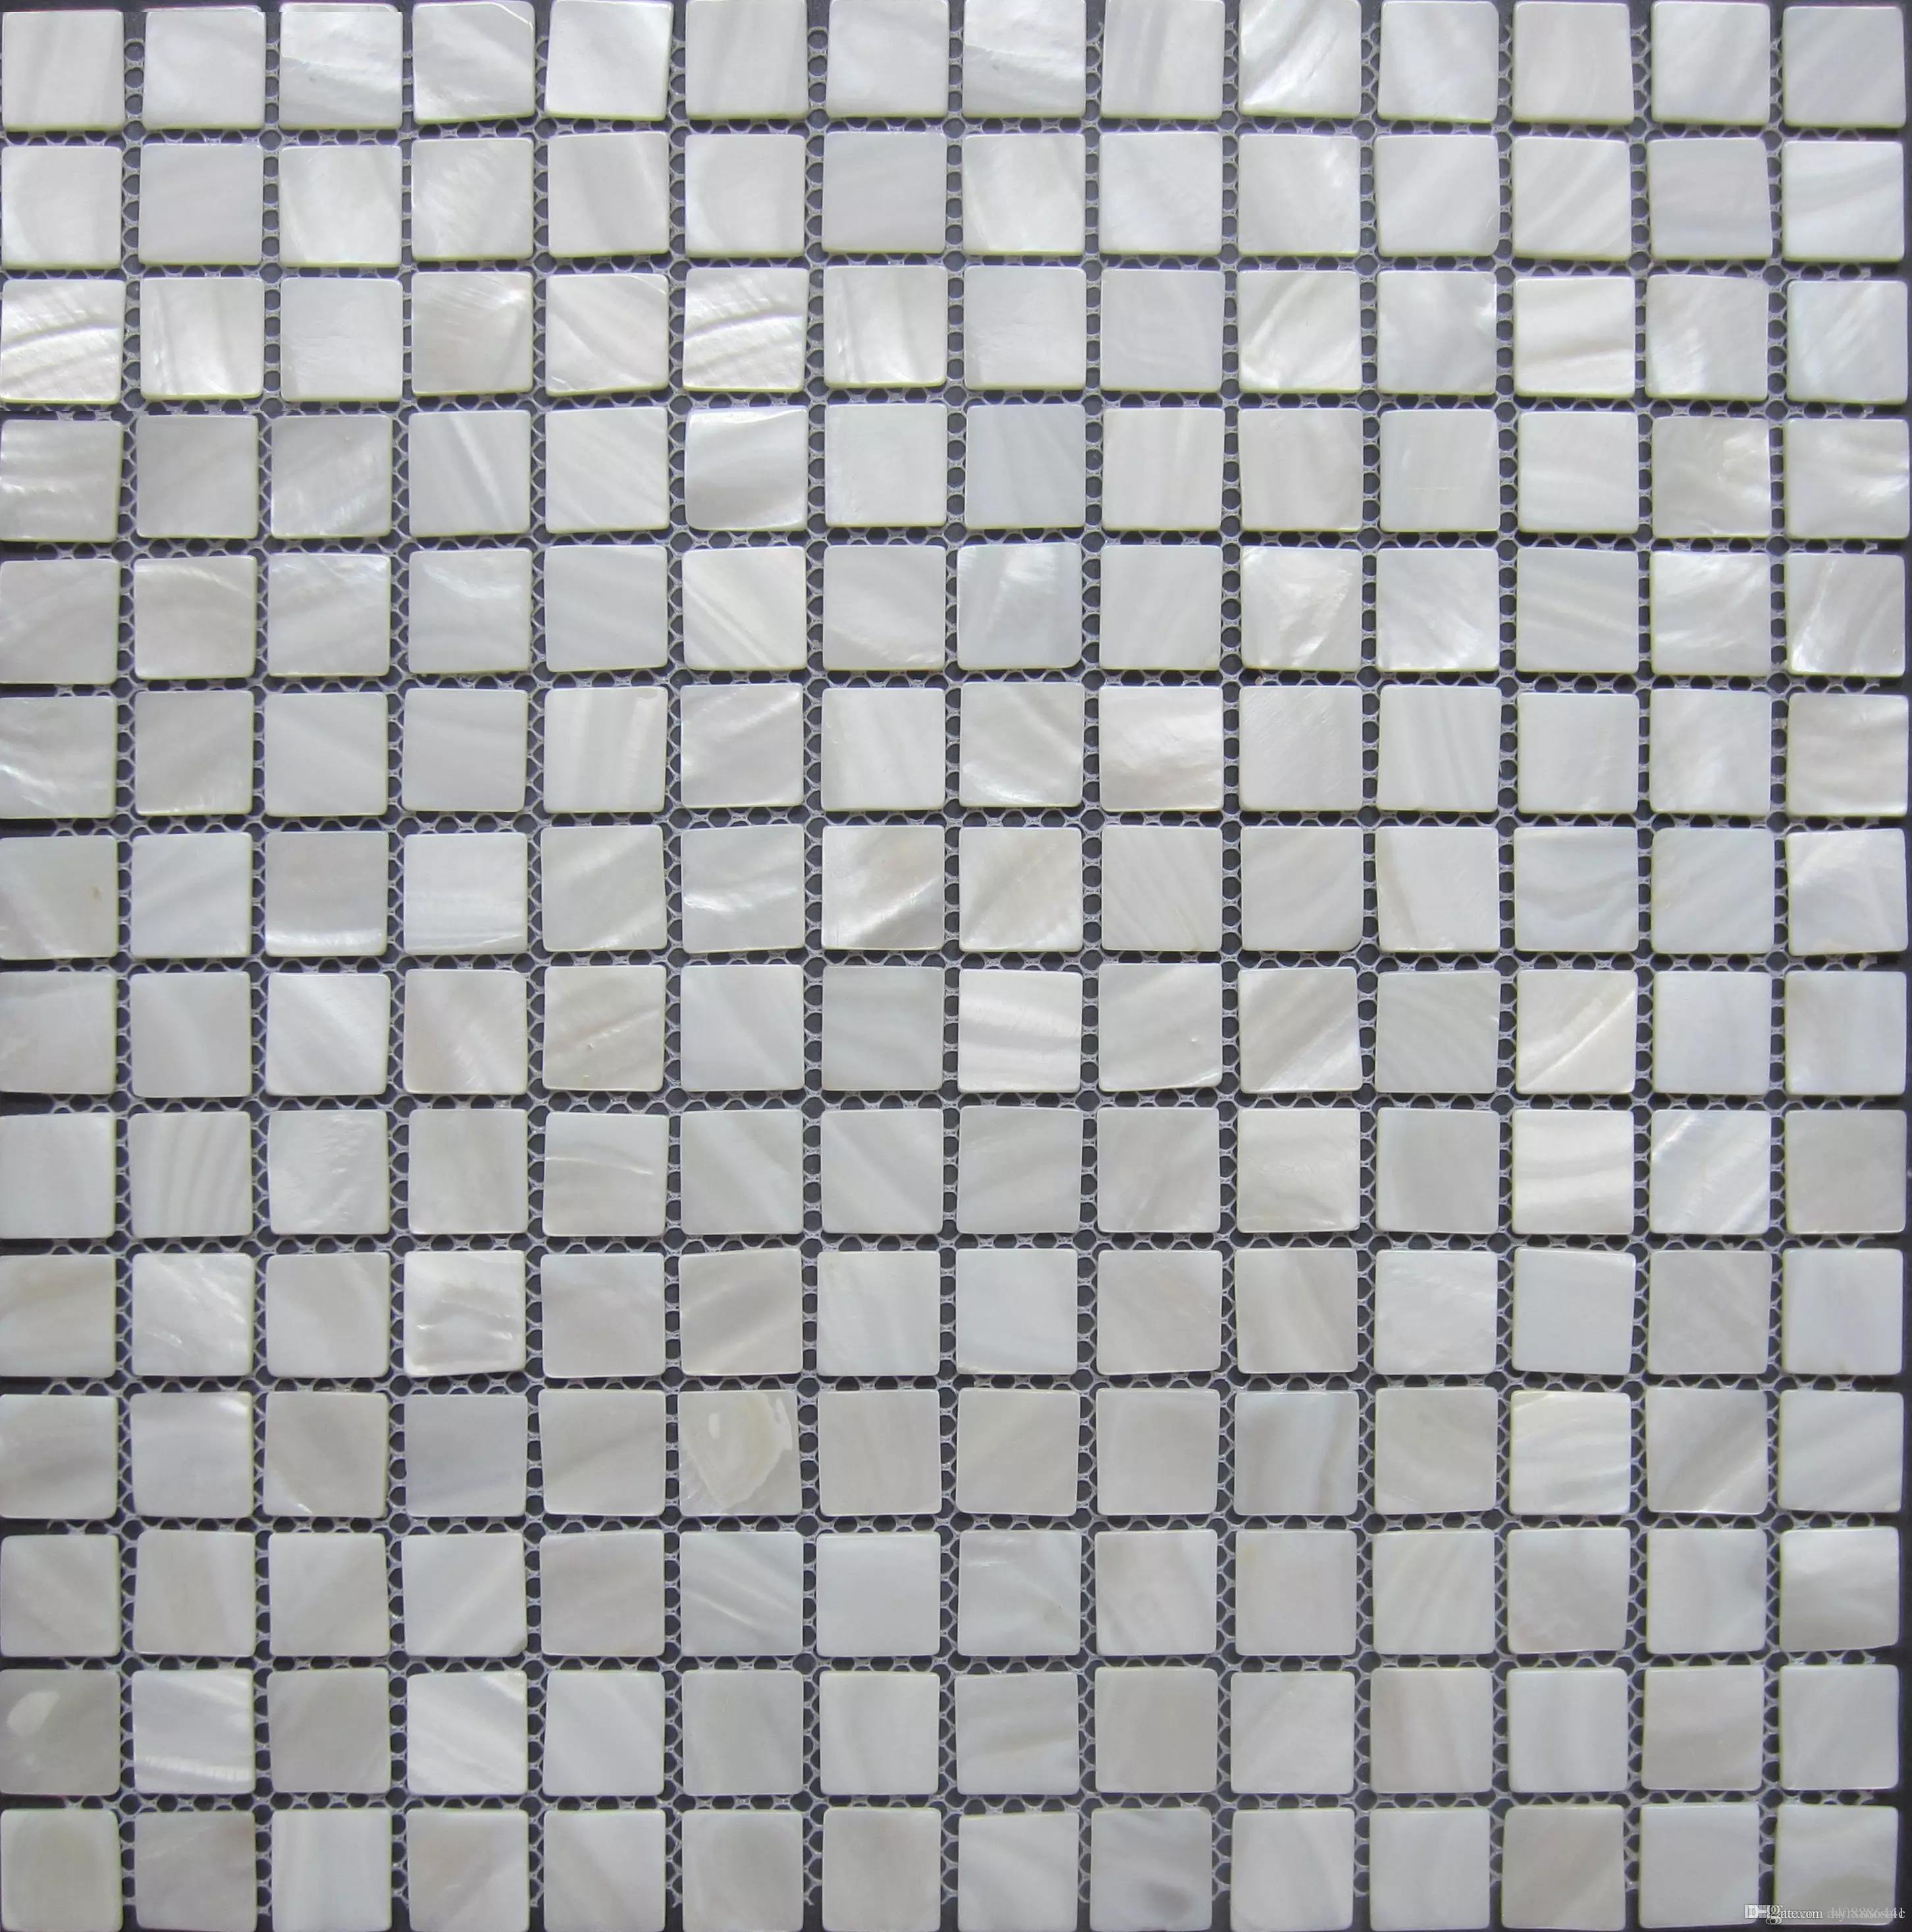 White Pearl Backsplash Part - 36: Lustre Mosaico Wall Tiles; Pure White Mother Of Pearl Shell Mosaic Tiles;  Kitchen Backsplash Tiles ;bathroom Mirror Tile Shell Mosaic Pure White  Mother Of ...